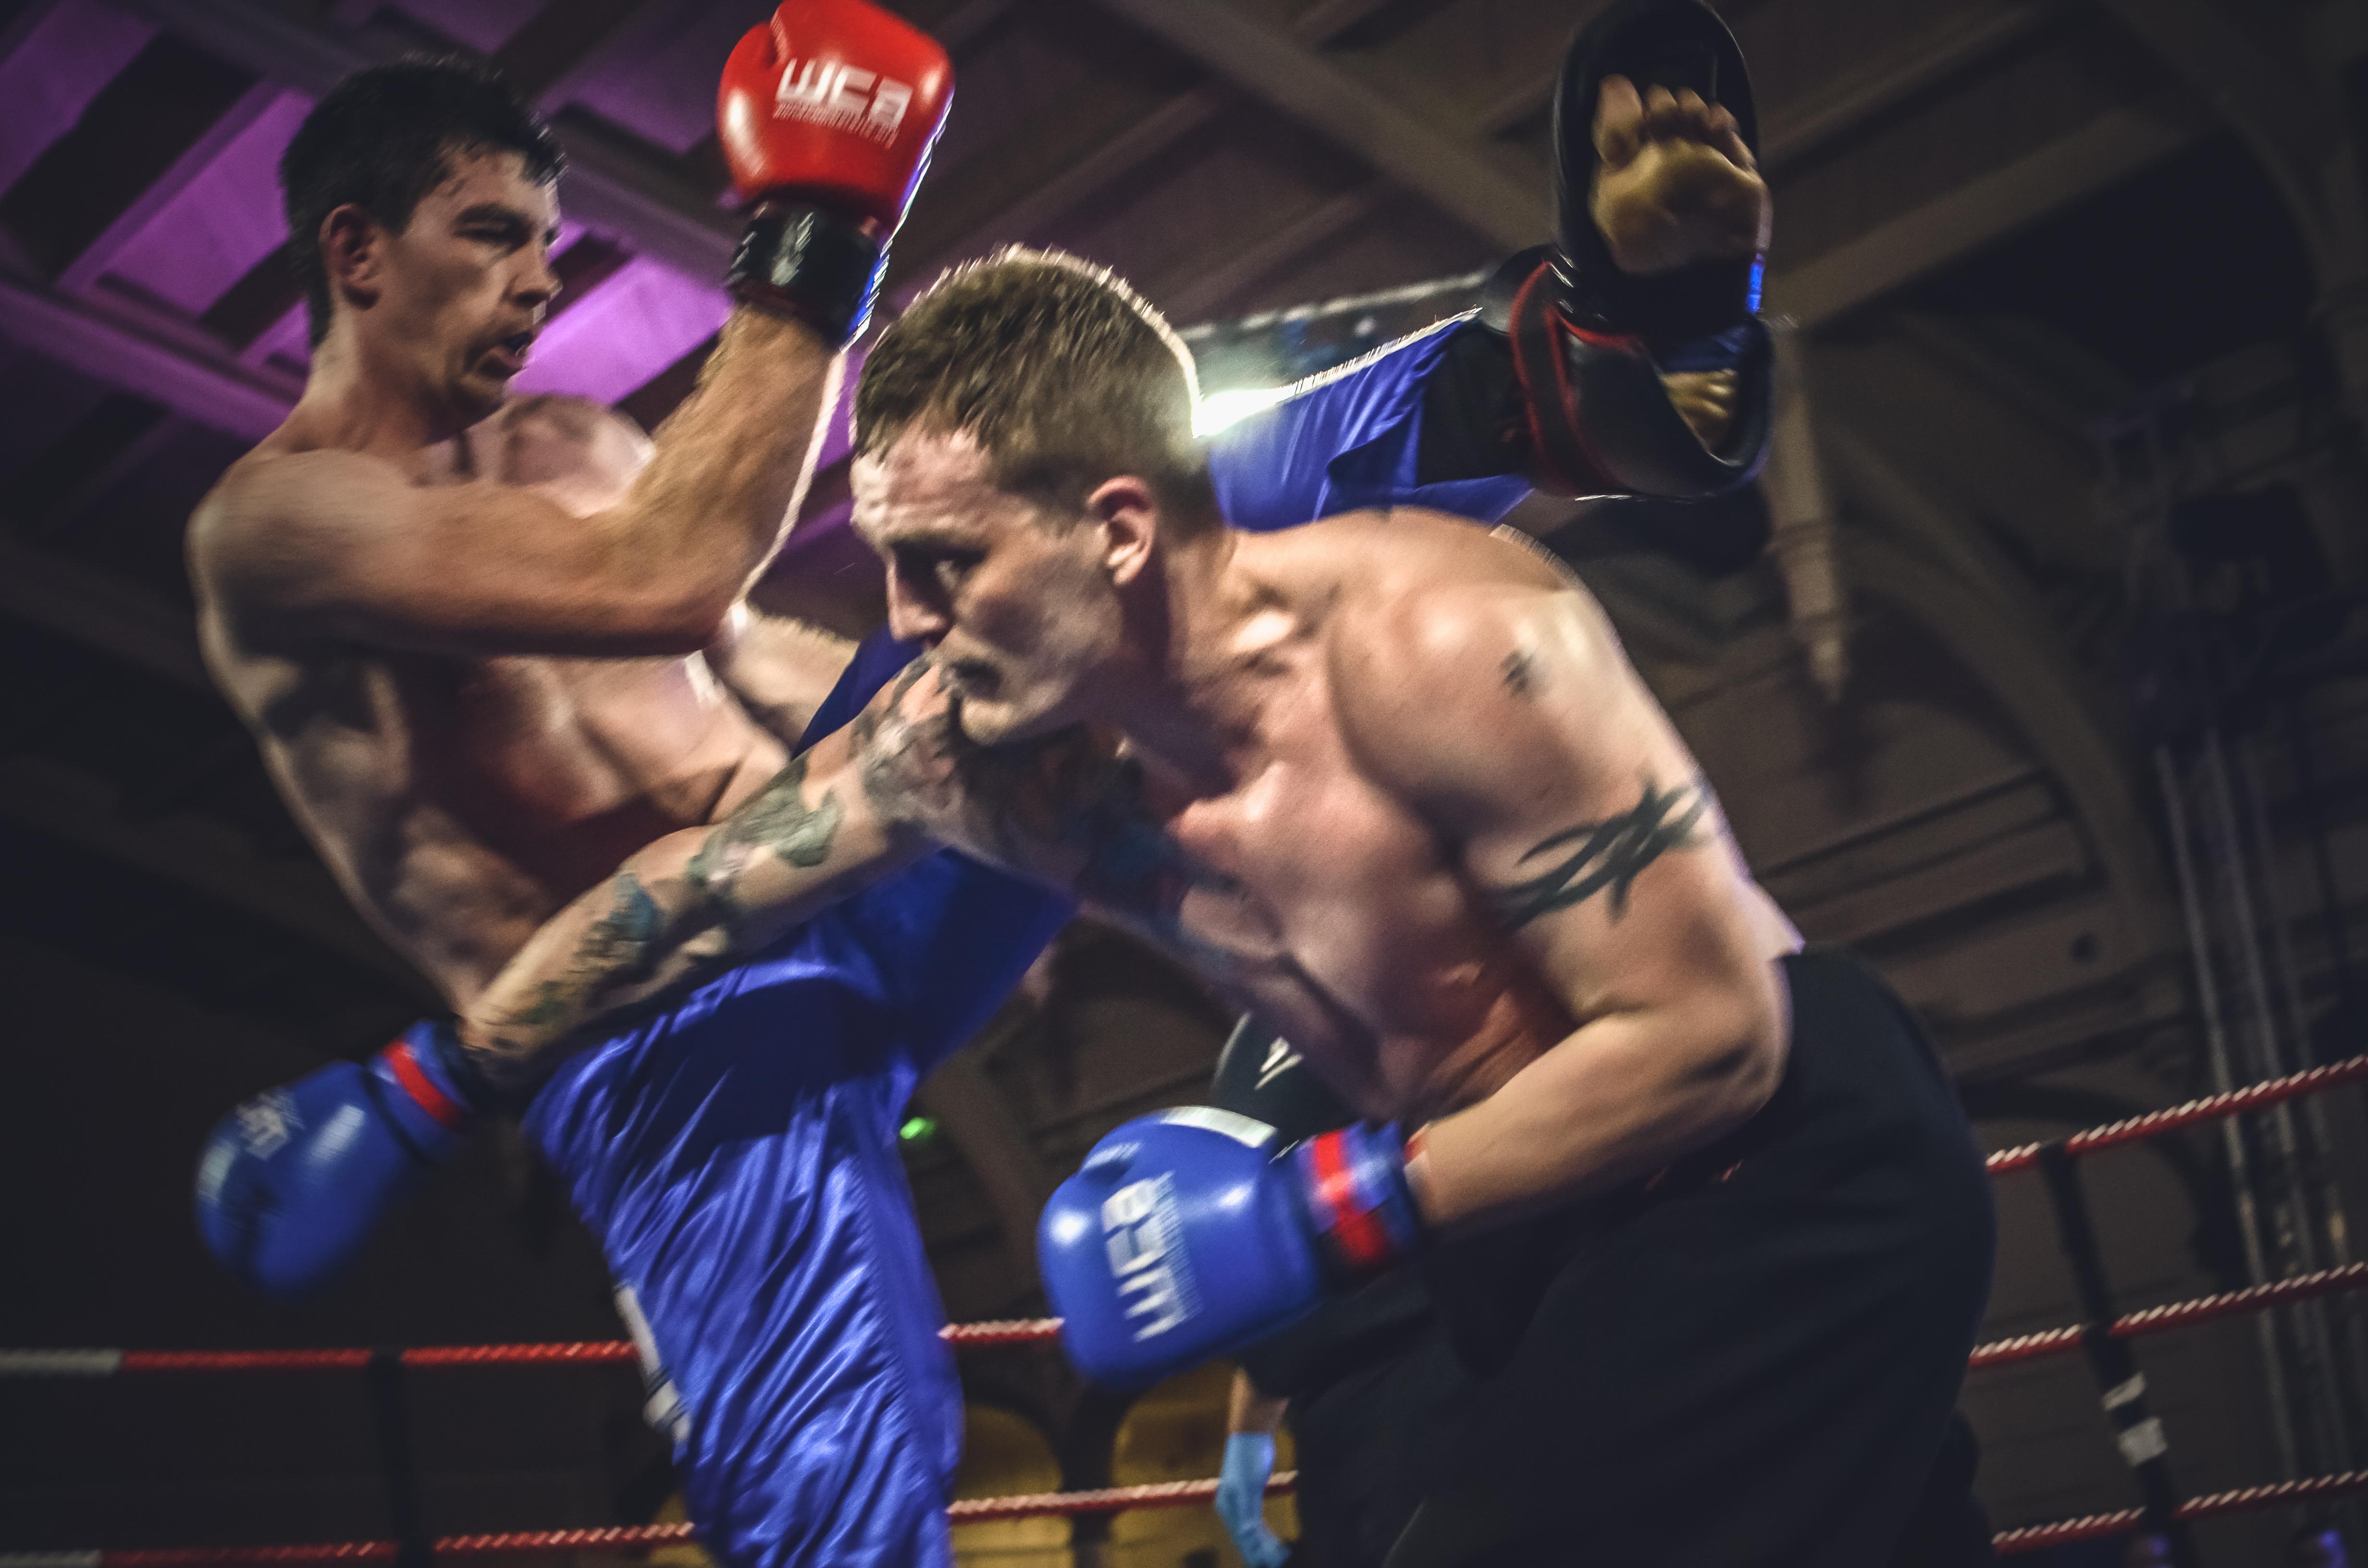 Shaun Forde vs Carl Mallinson